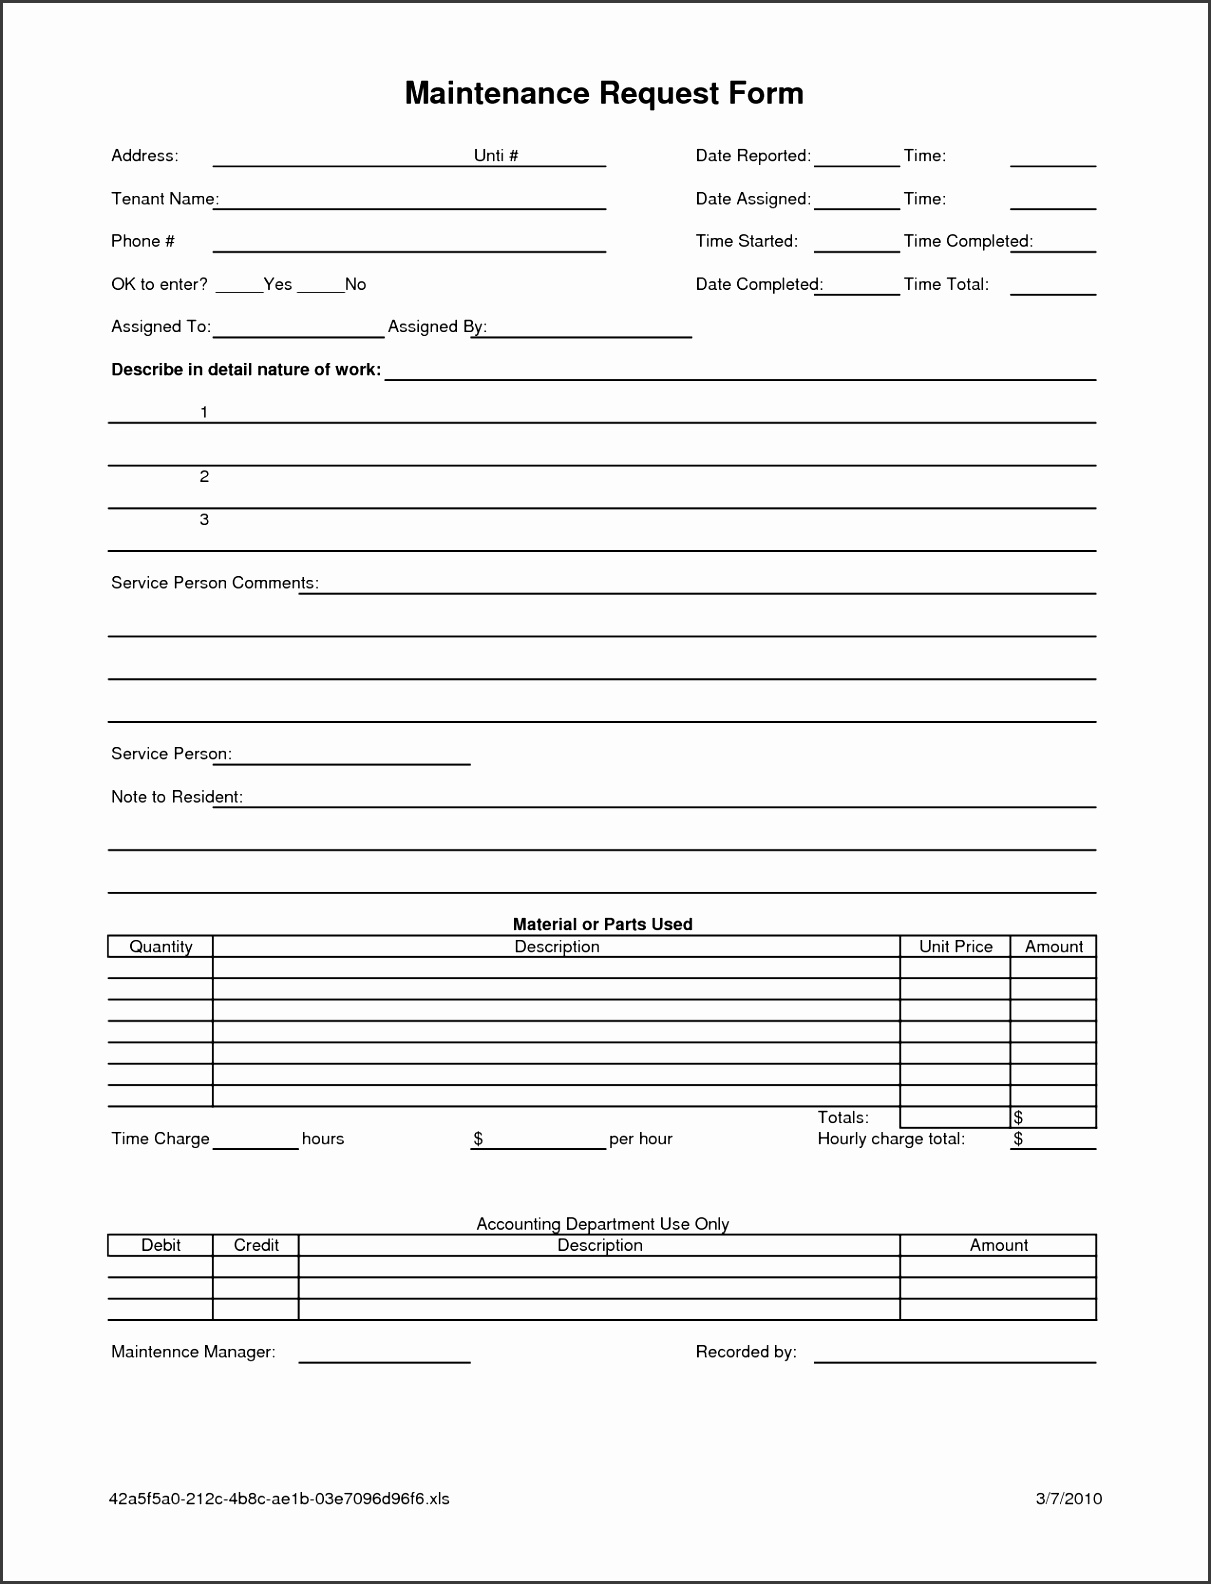 Maintenance Work Order Request Form